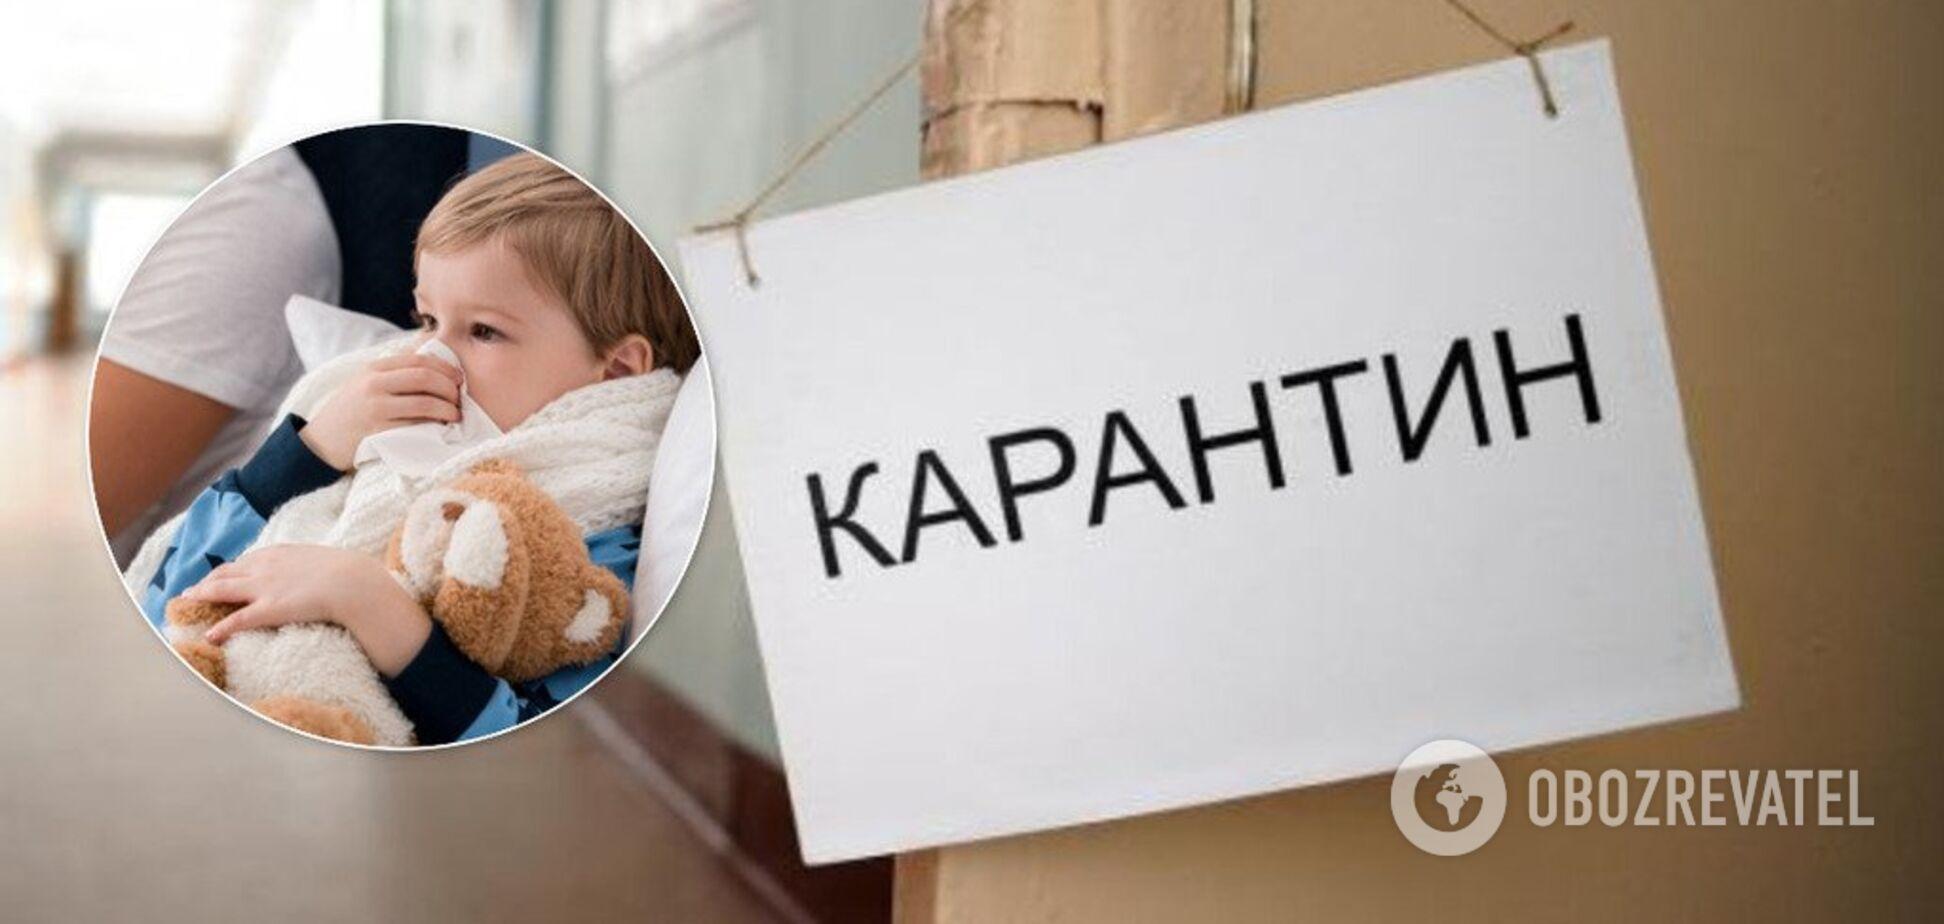 Грипп 'косит' черкасщан: школы областного центра закрыли на карантин